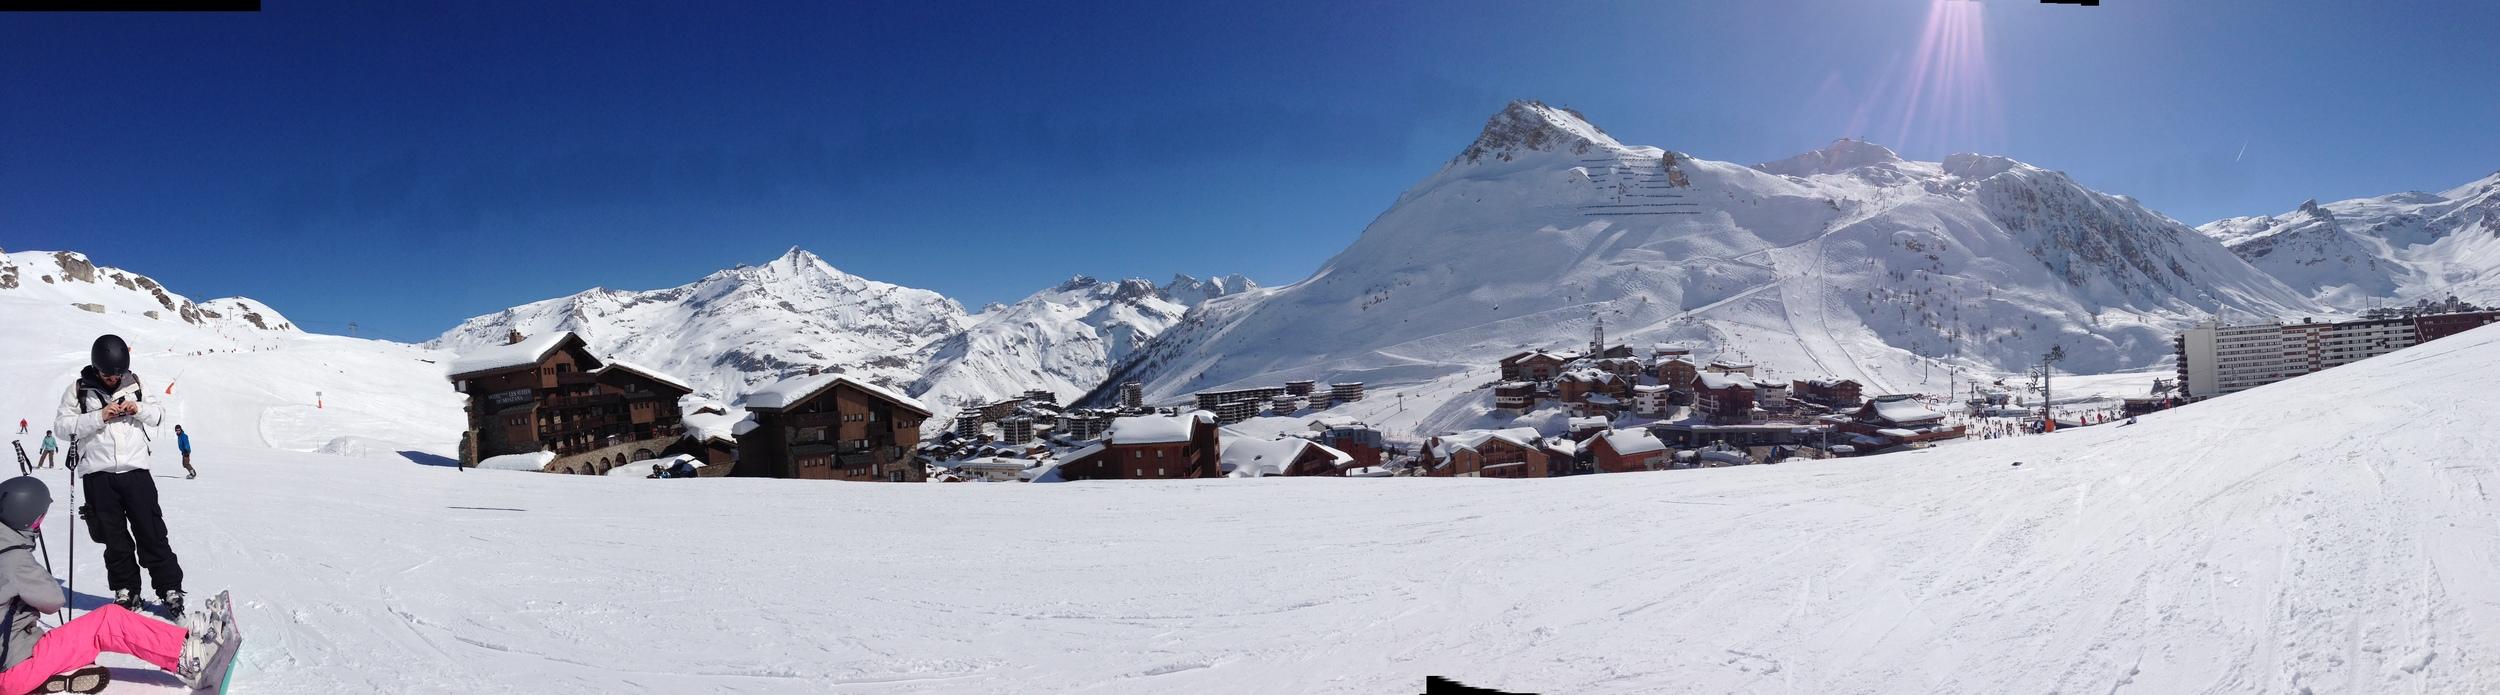 The view in Tignes. Sjnien and Loek on the left.